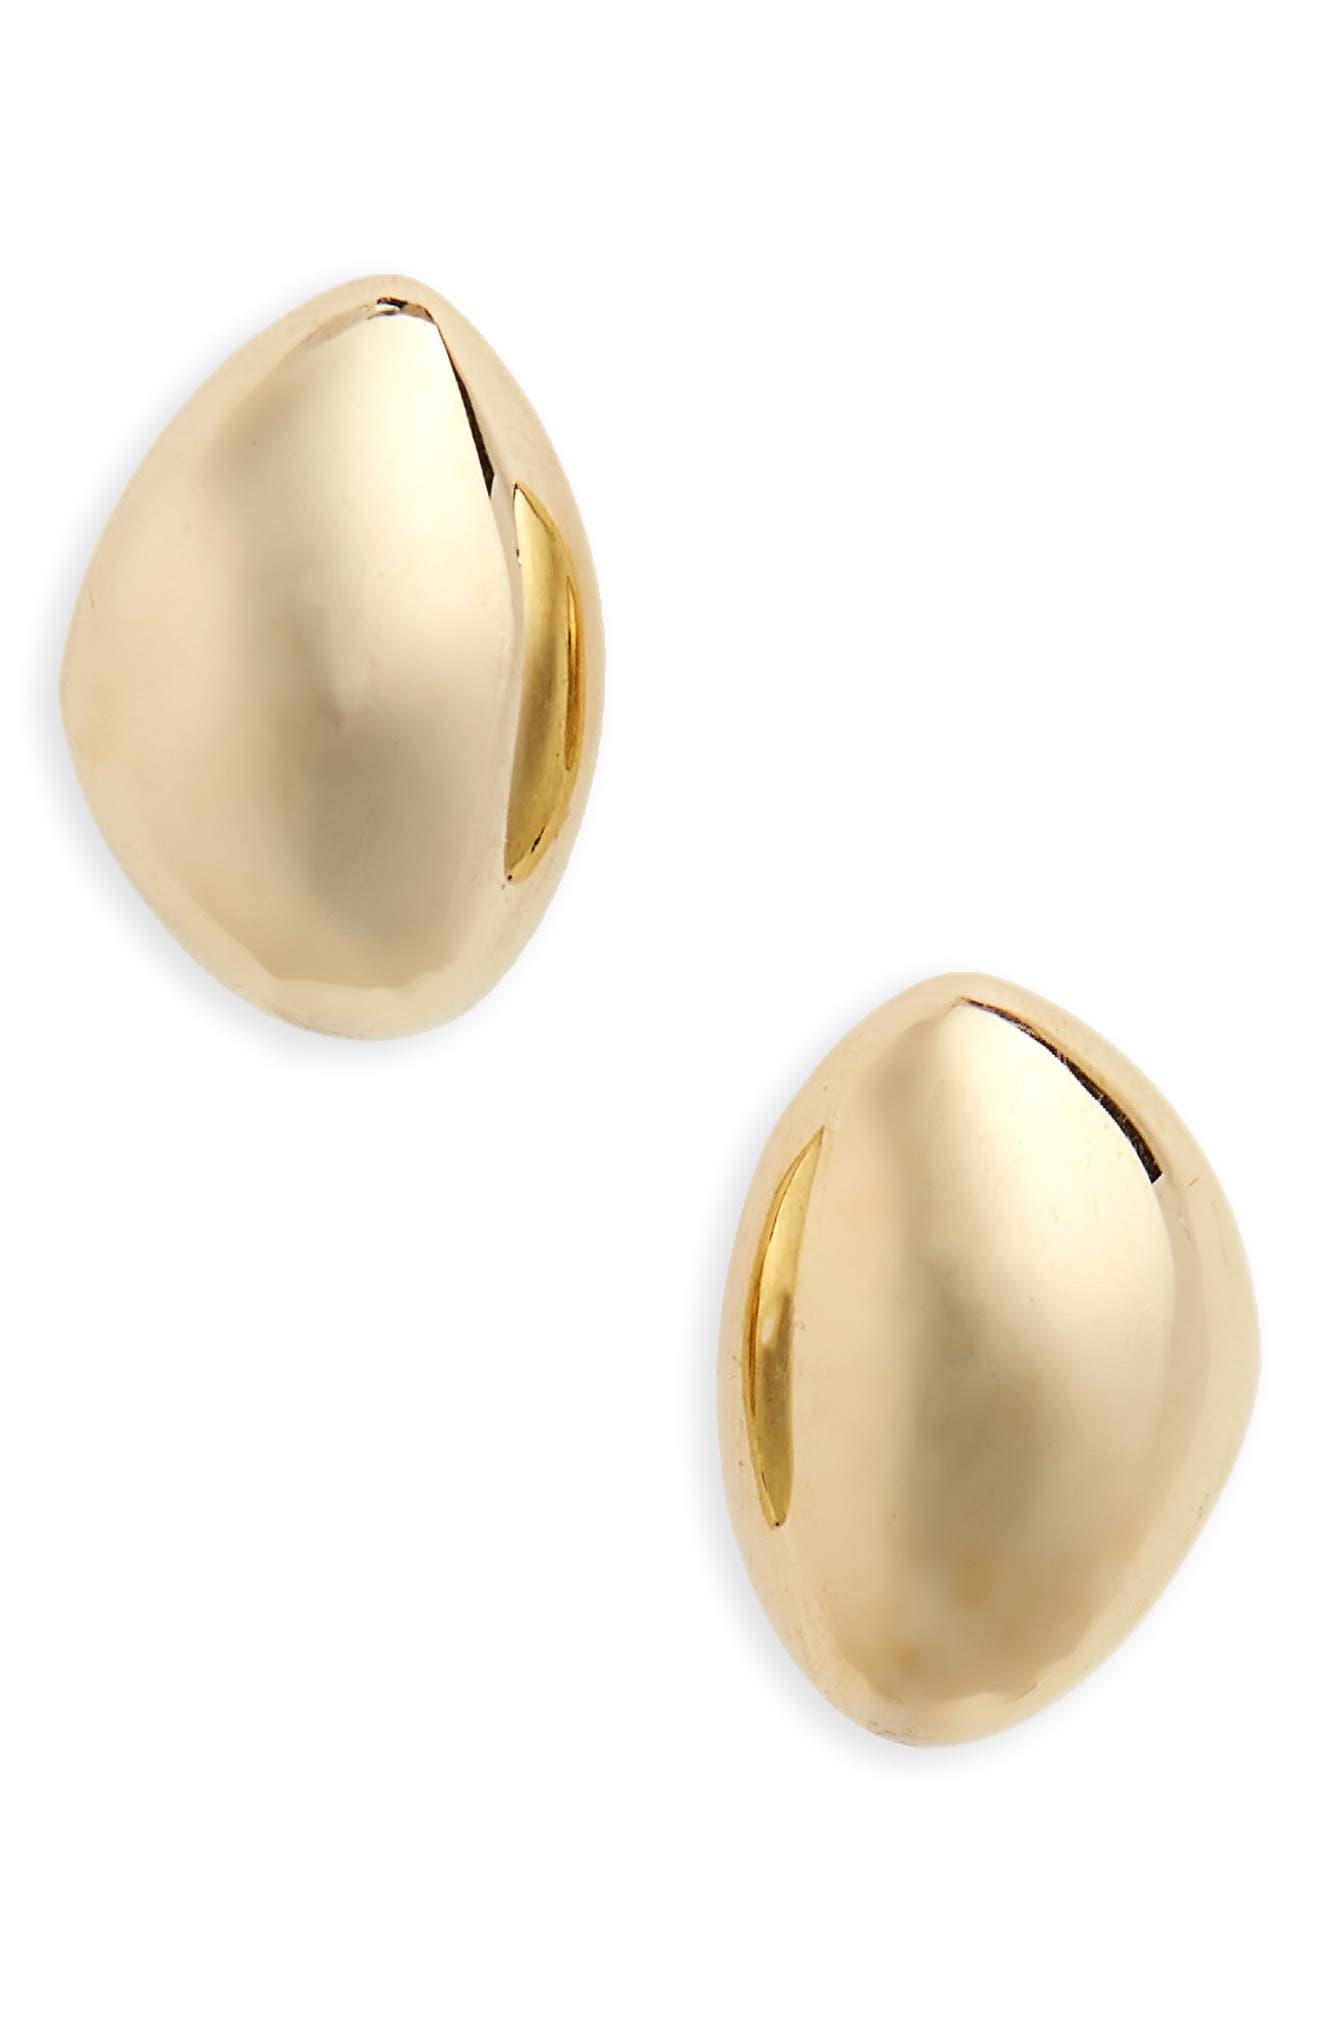 Soko Sabi Stud Earrings